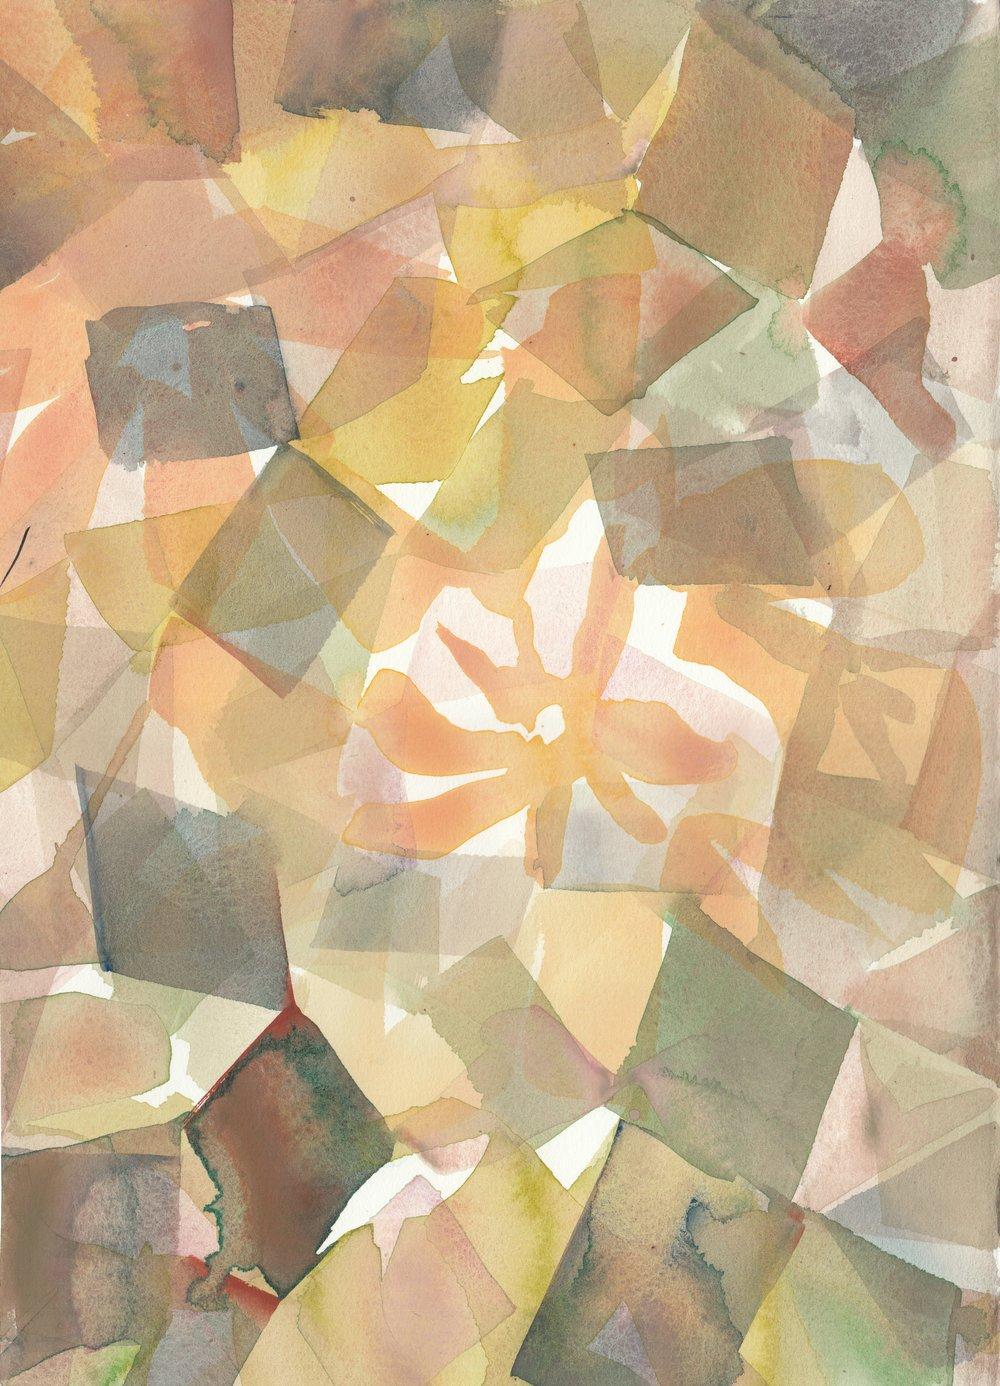 """Sun Dapple""  16.5"" height x 12.25"" width #001"